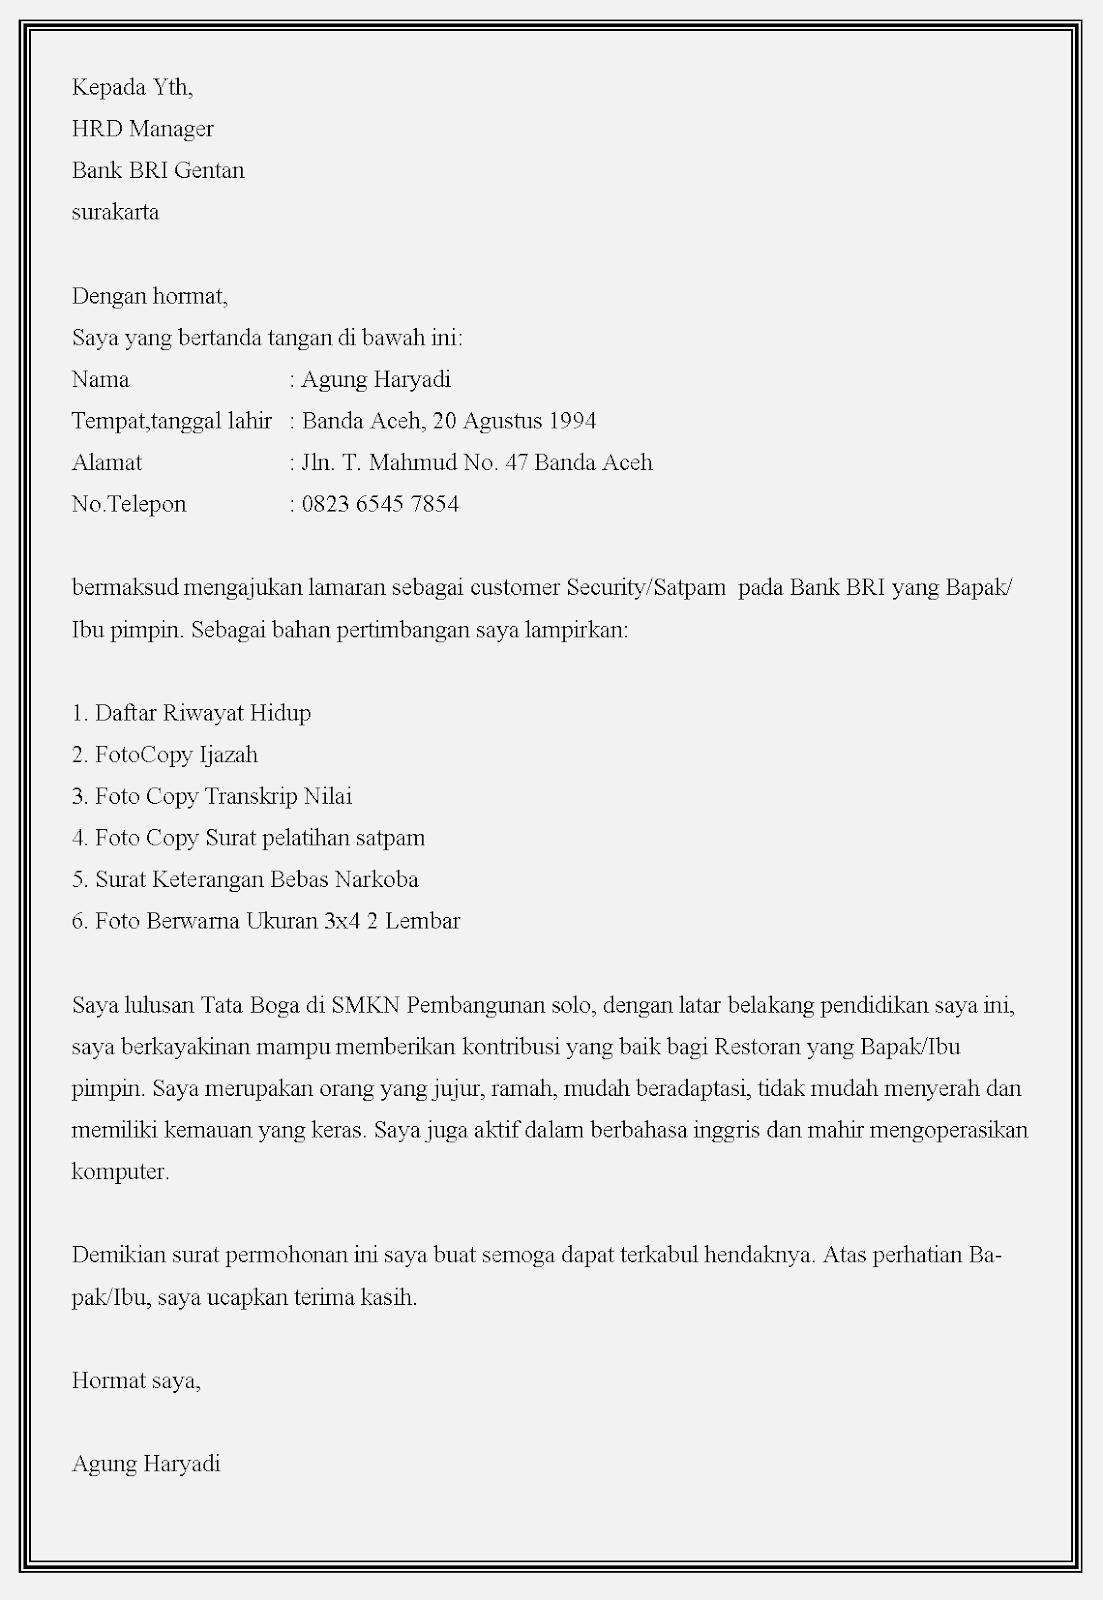 Contoh surat lamaran kerja security bank BRI